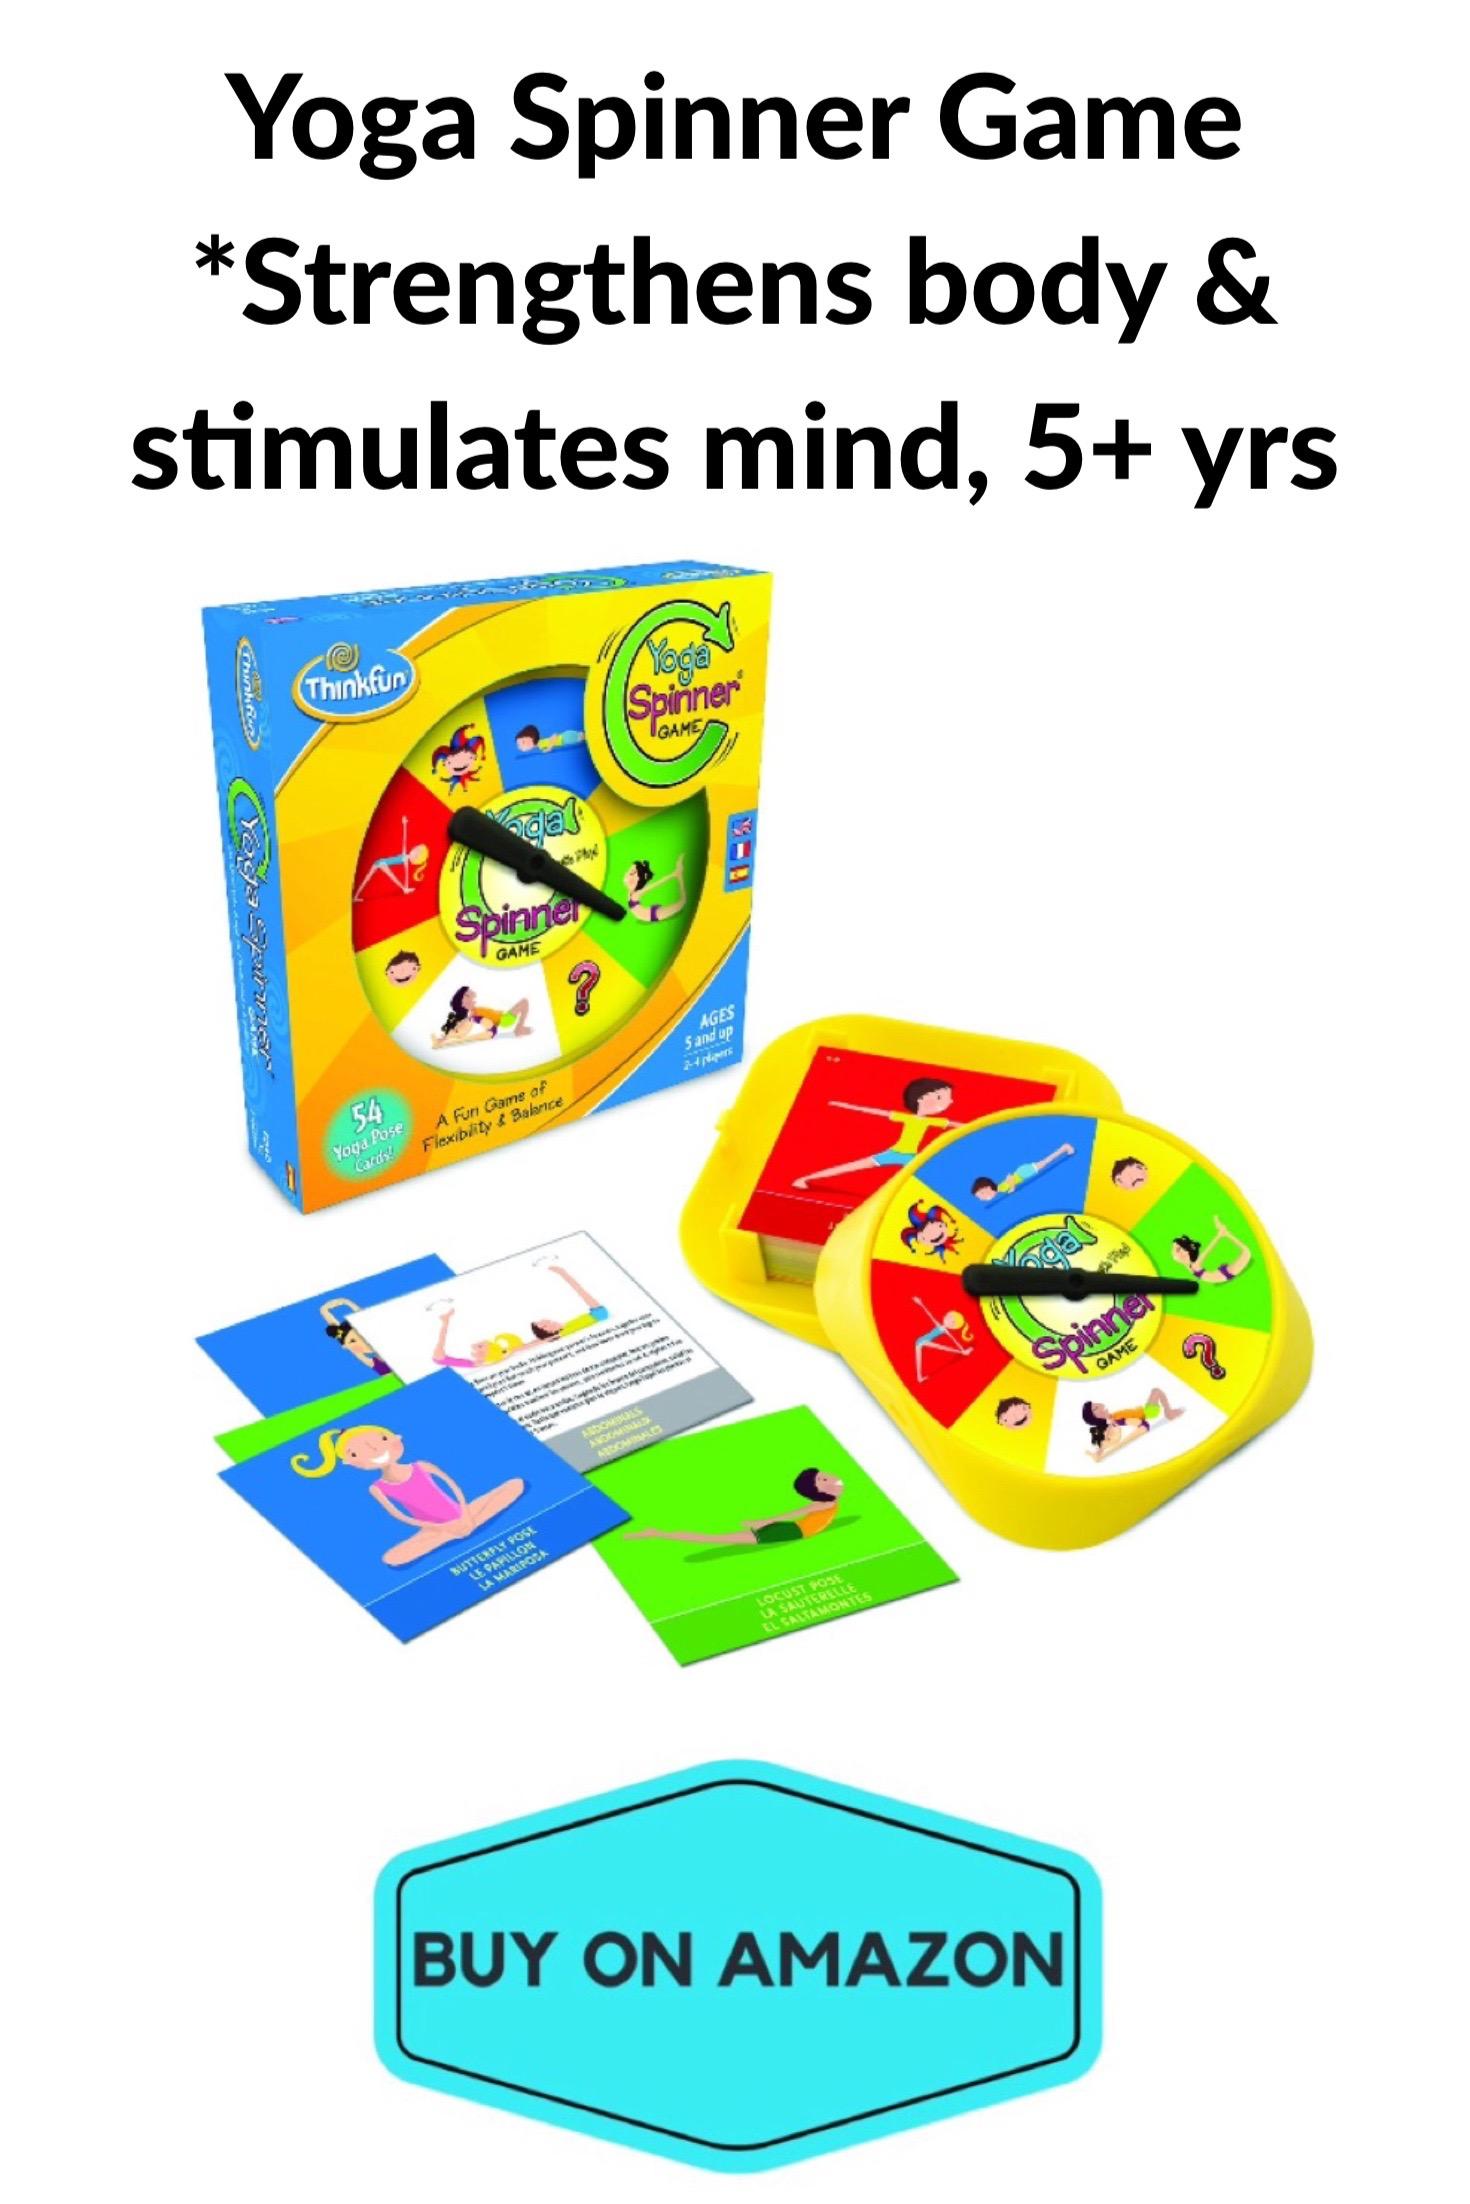 Yoga Spinner Game, Age 5+